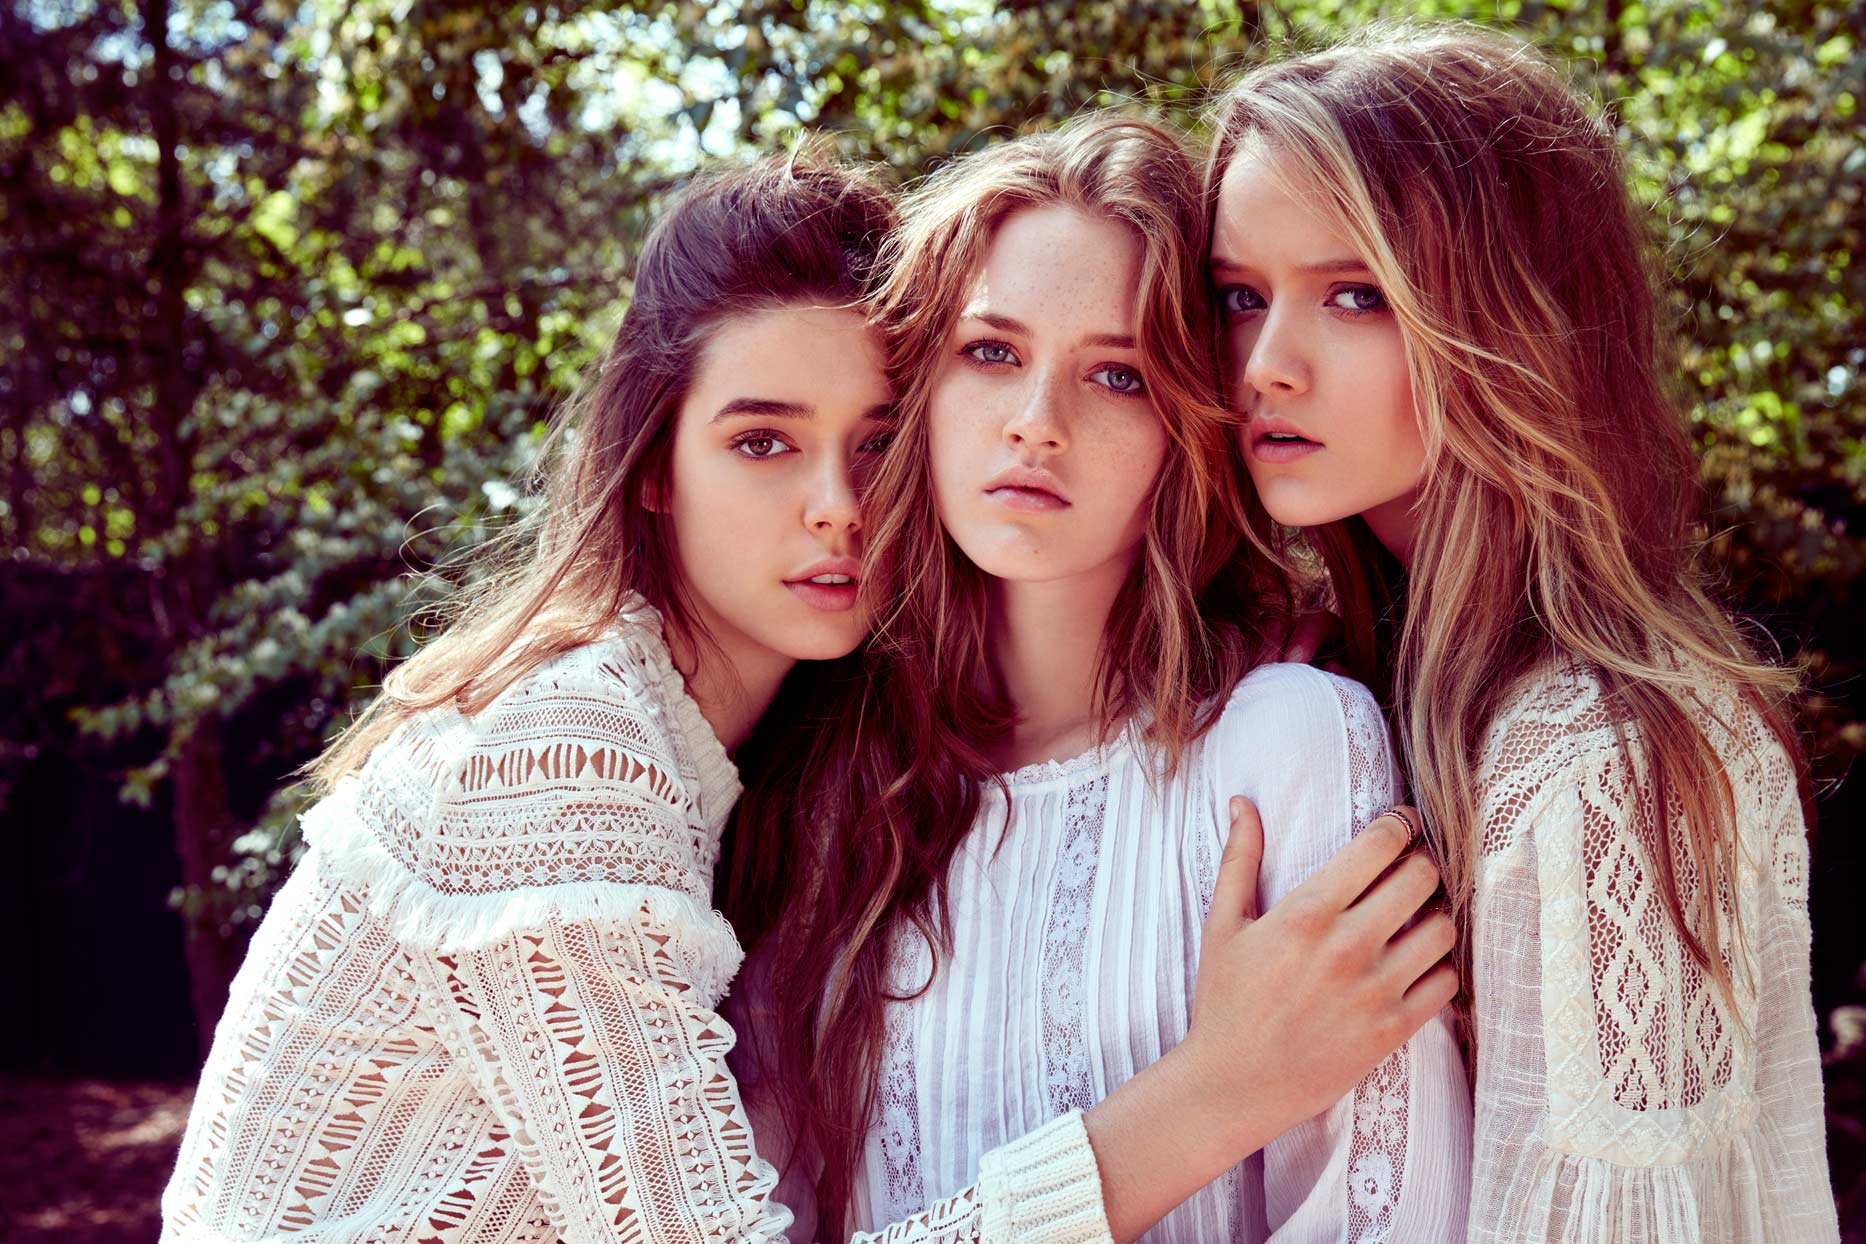 Three girls modeling all wearing white elegant tops - Mark DeLong: Fashion Gallery